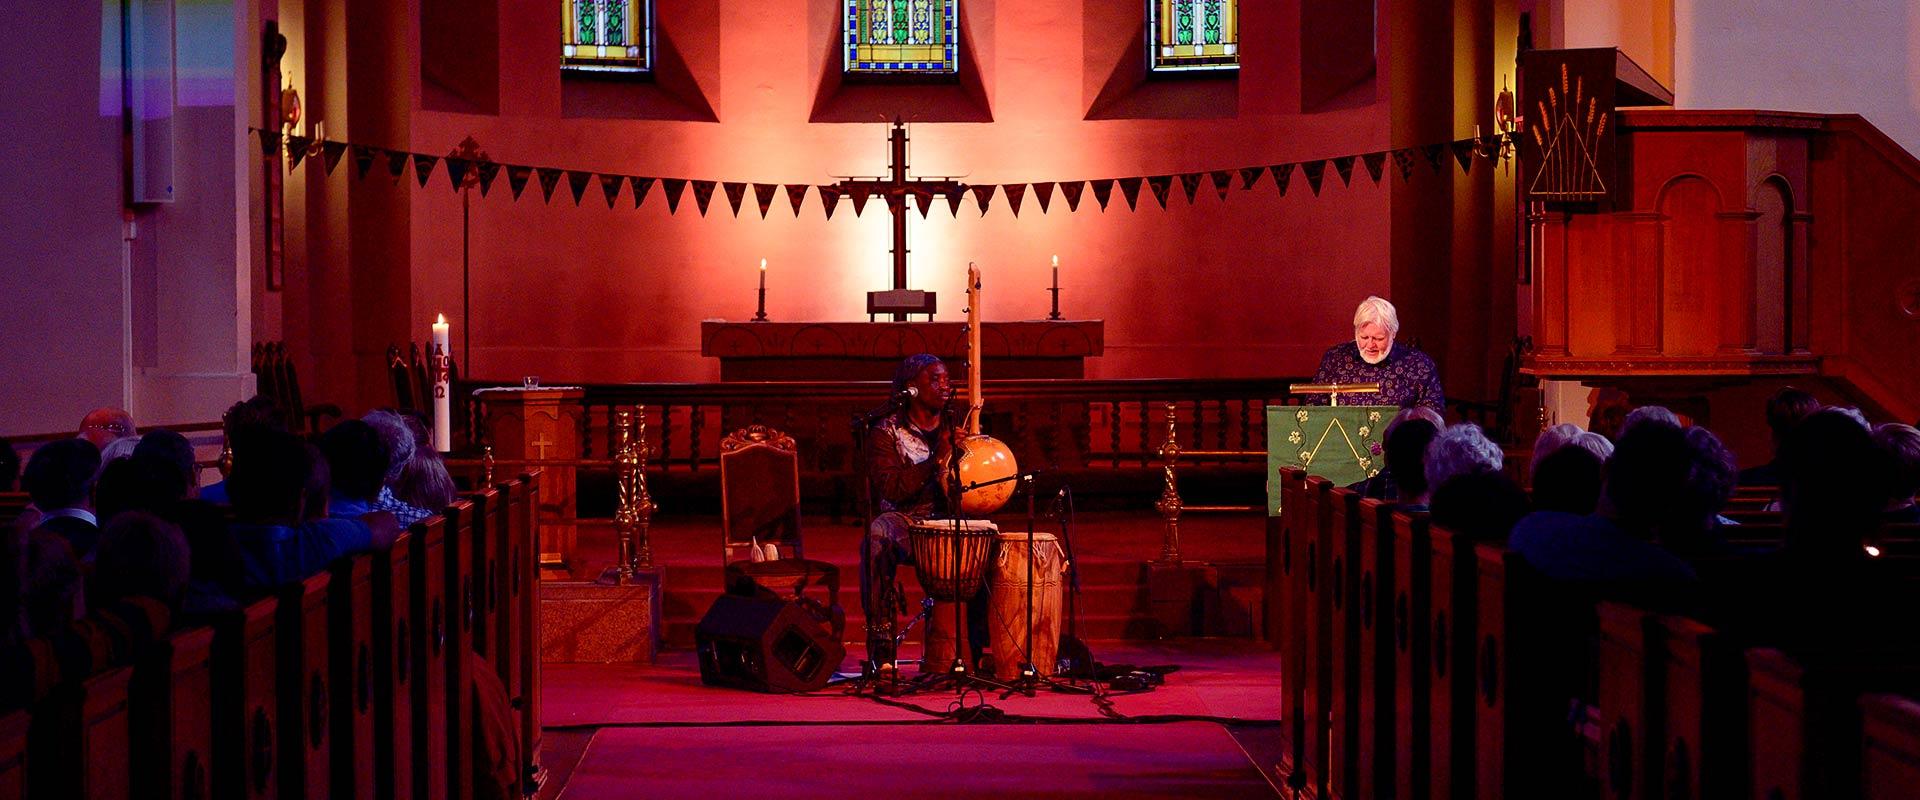 Gronland Church Oslo Afro Arts 2019